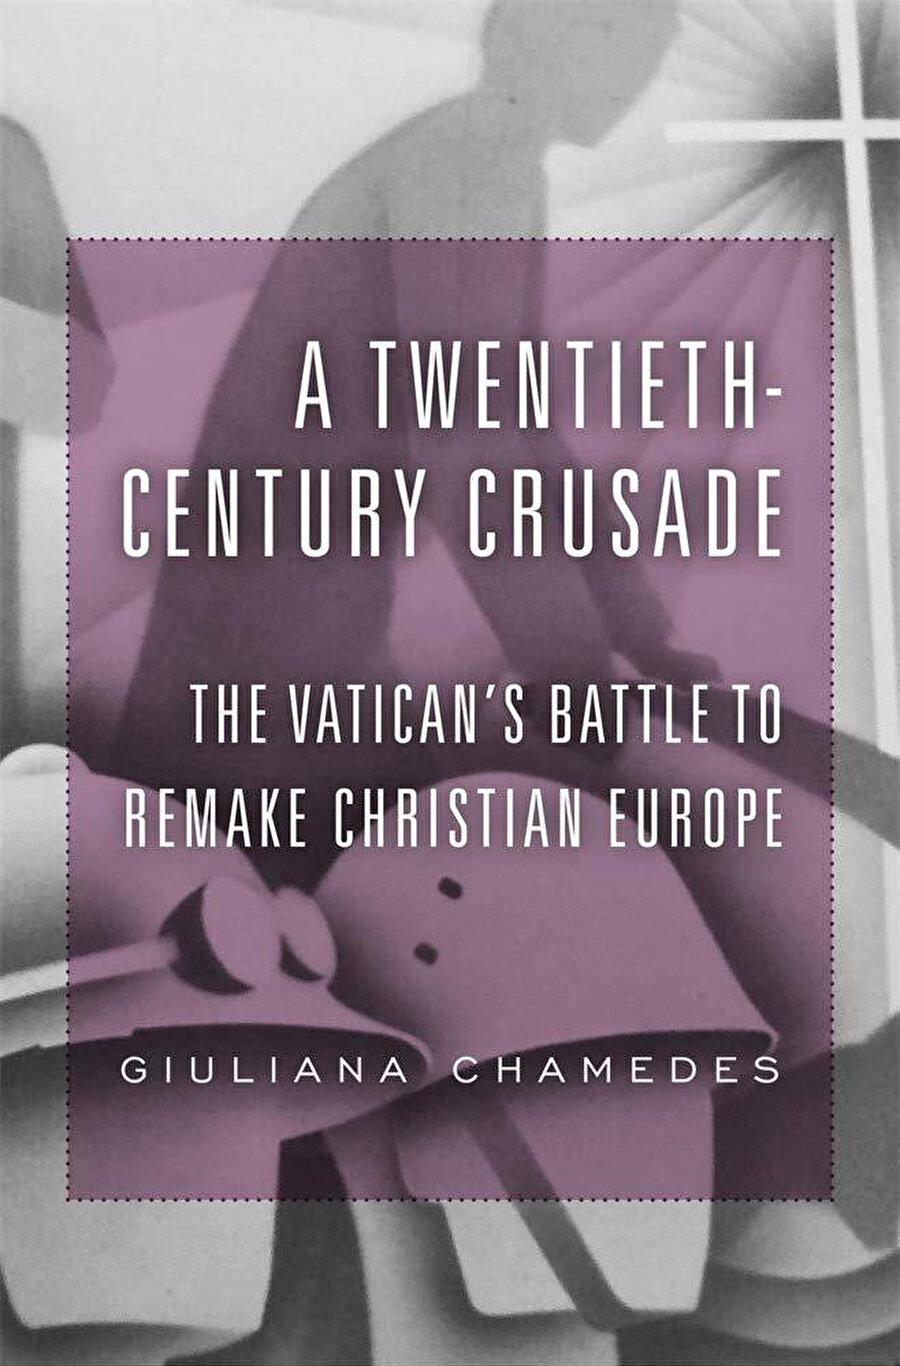 Giuliana Chamedes, A Twentieth-Century Crusade - The Vatican's Battle to Remake Christian Europe, Harvard University Press, 2019